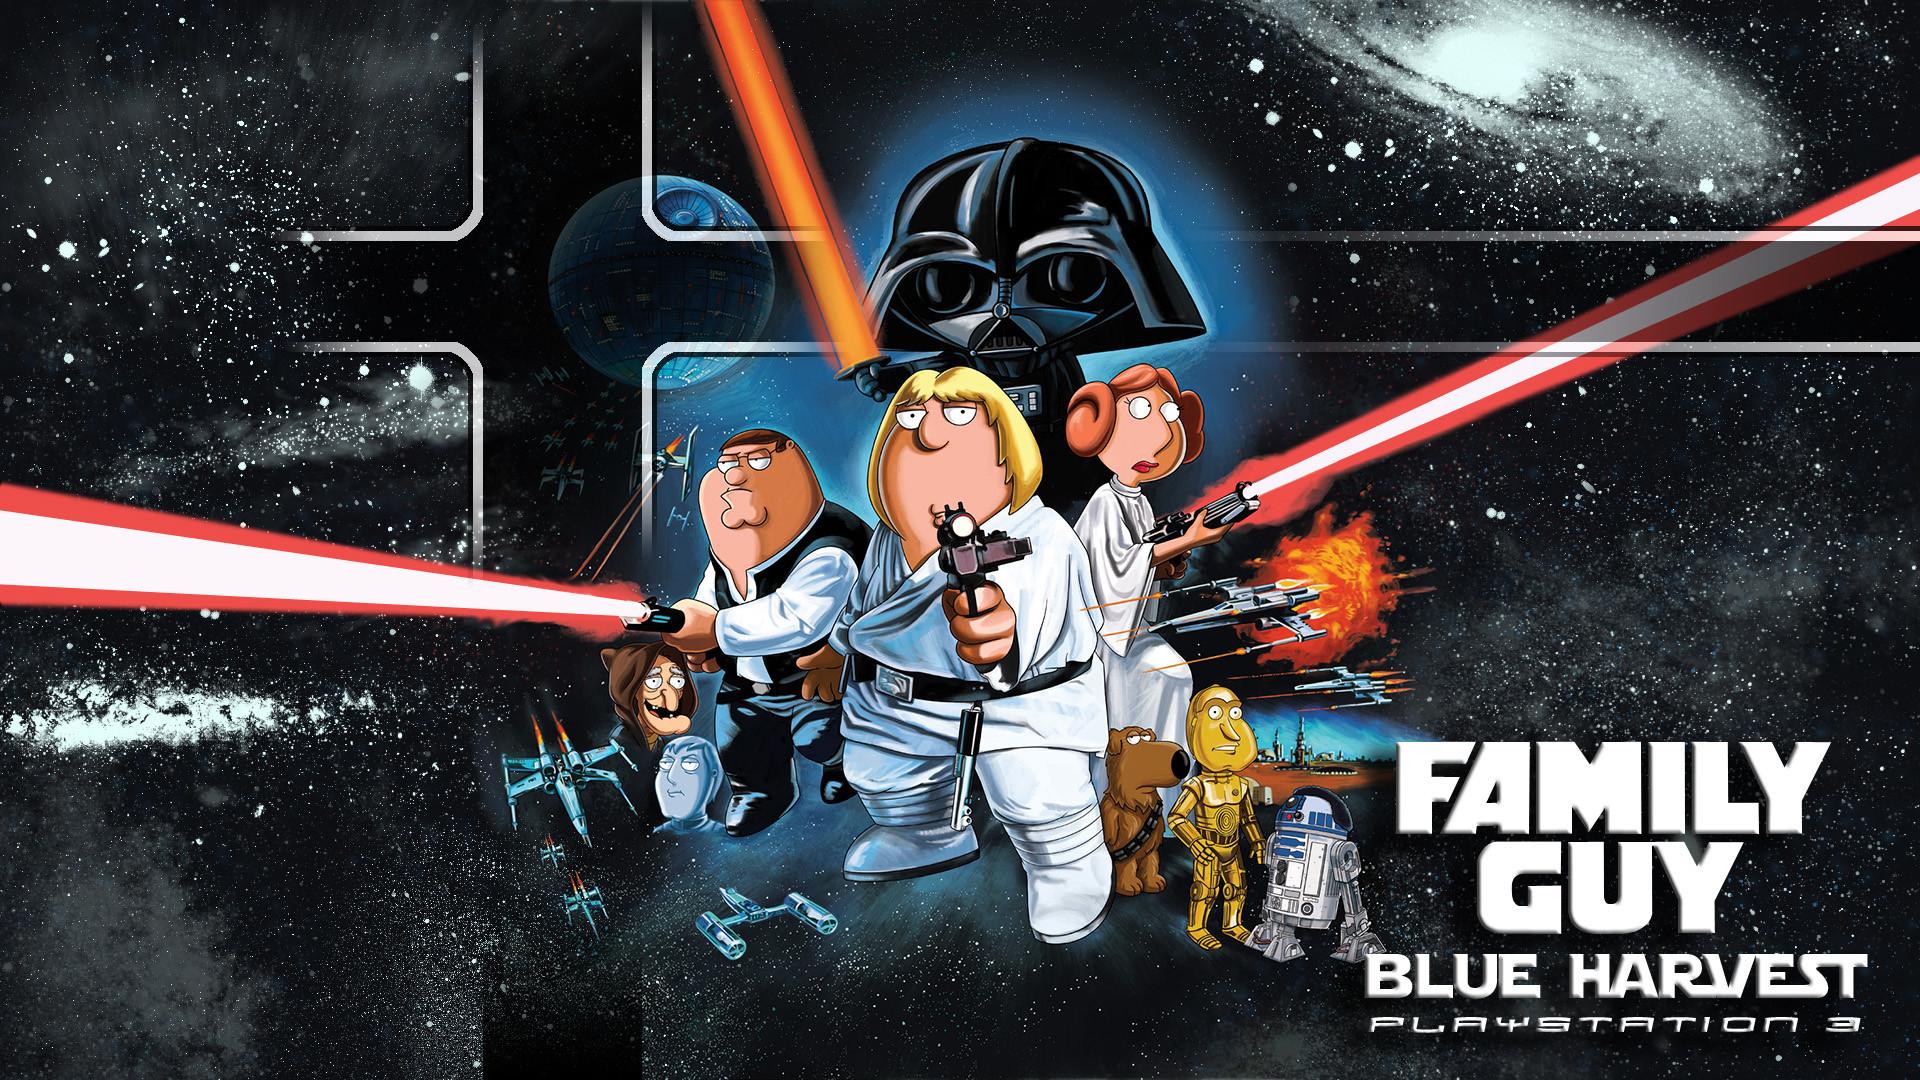 Family Guy trilogia Star Wars en espa̱ol calidad DVD РTaringa!